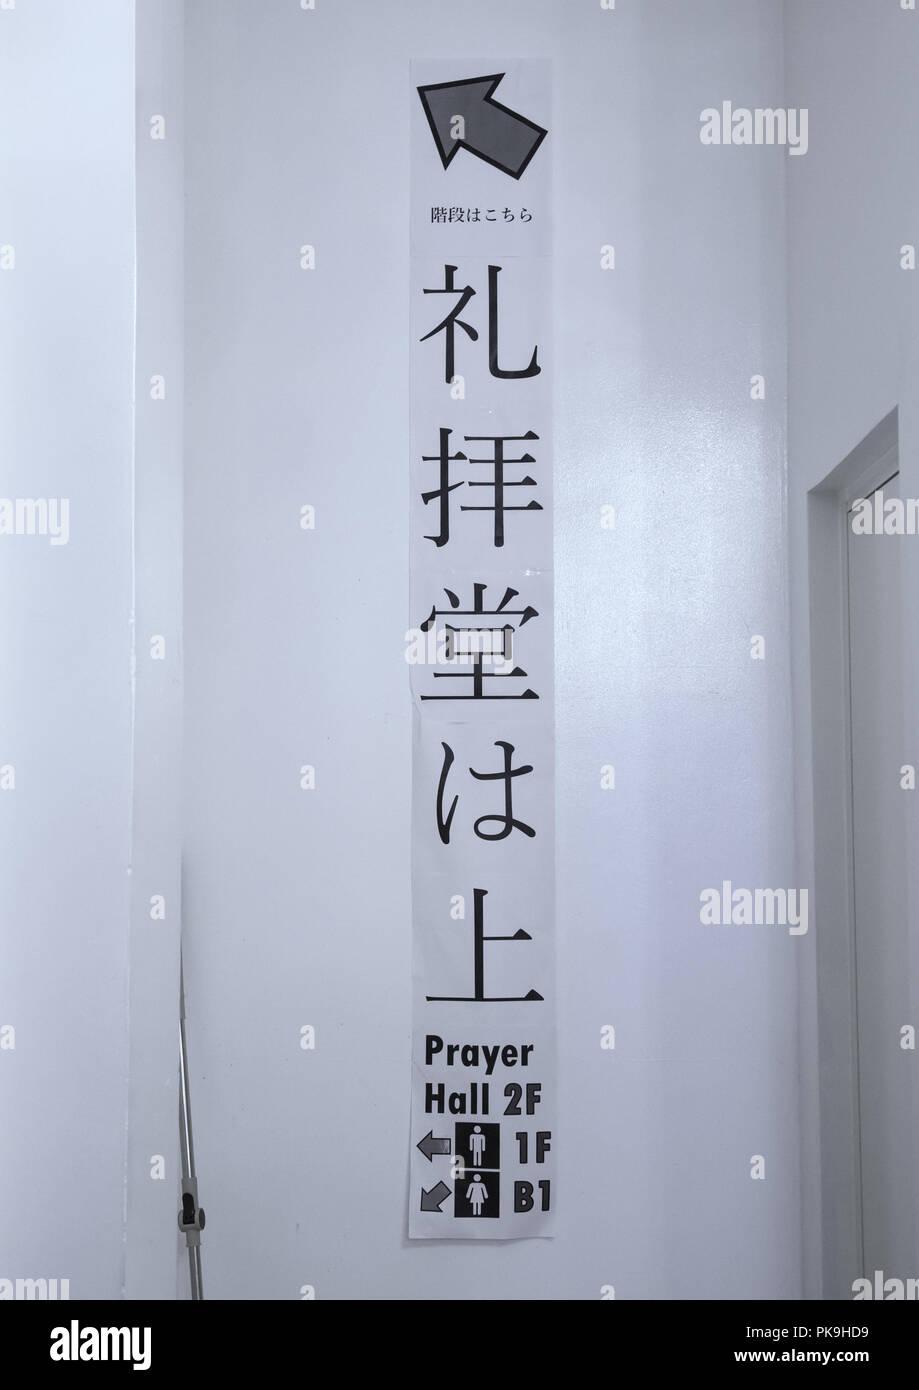 Prayer hall billboard inside Oyama-cho Tokyo Camii mosque, Kanto region, Tokyo, Japan - Stock Image